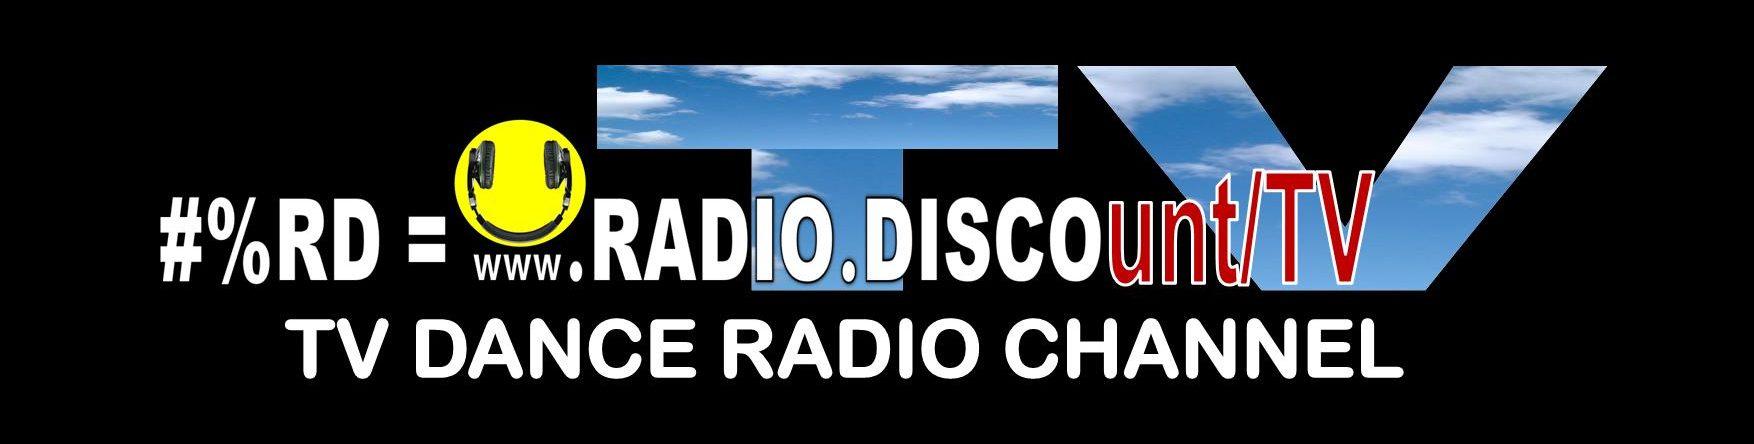 #% RADIO.DISCOunt/TV